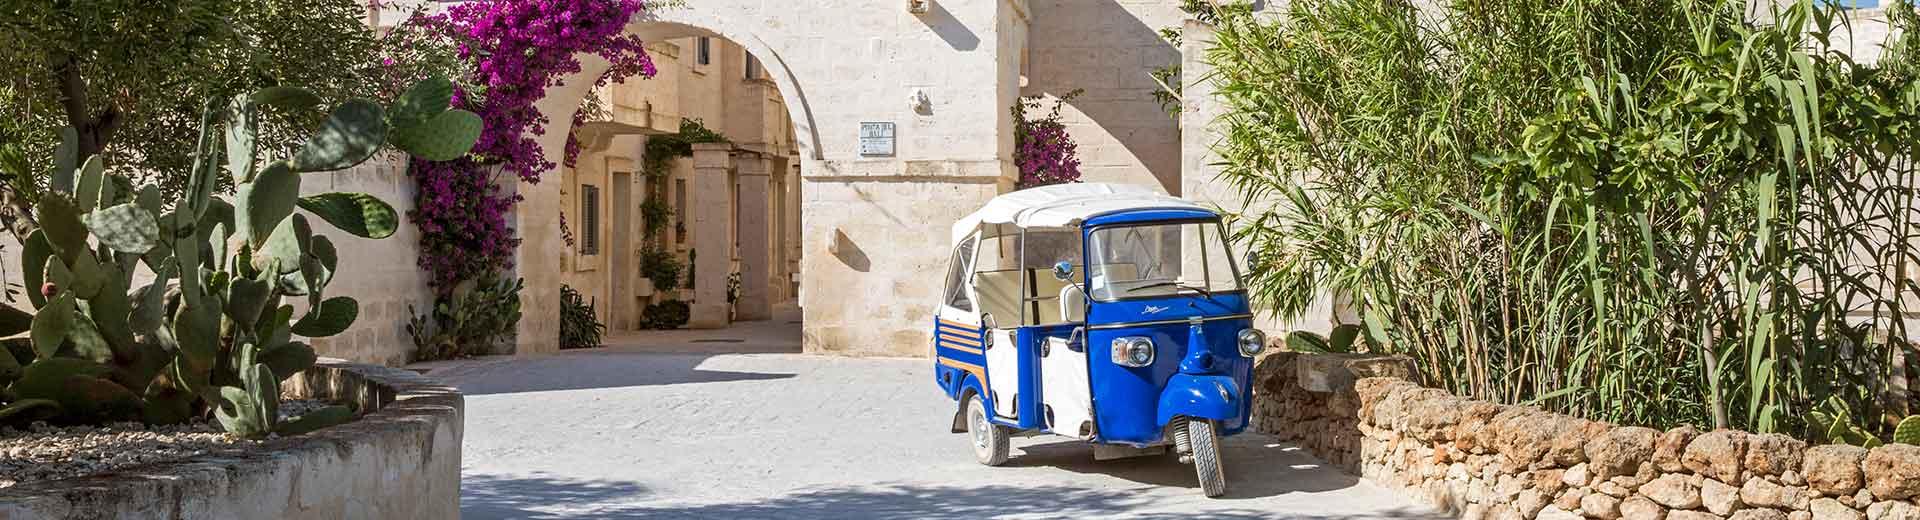 a old fashioned car outside of borgo egnazia hotel in puglia, italy